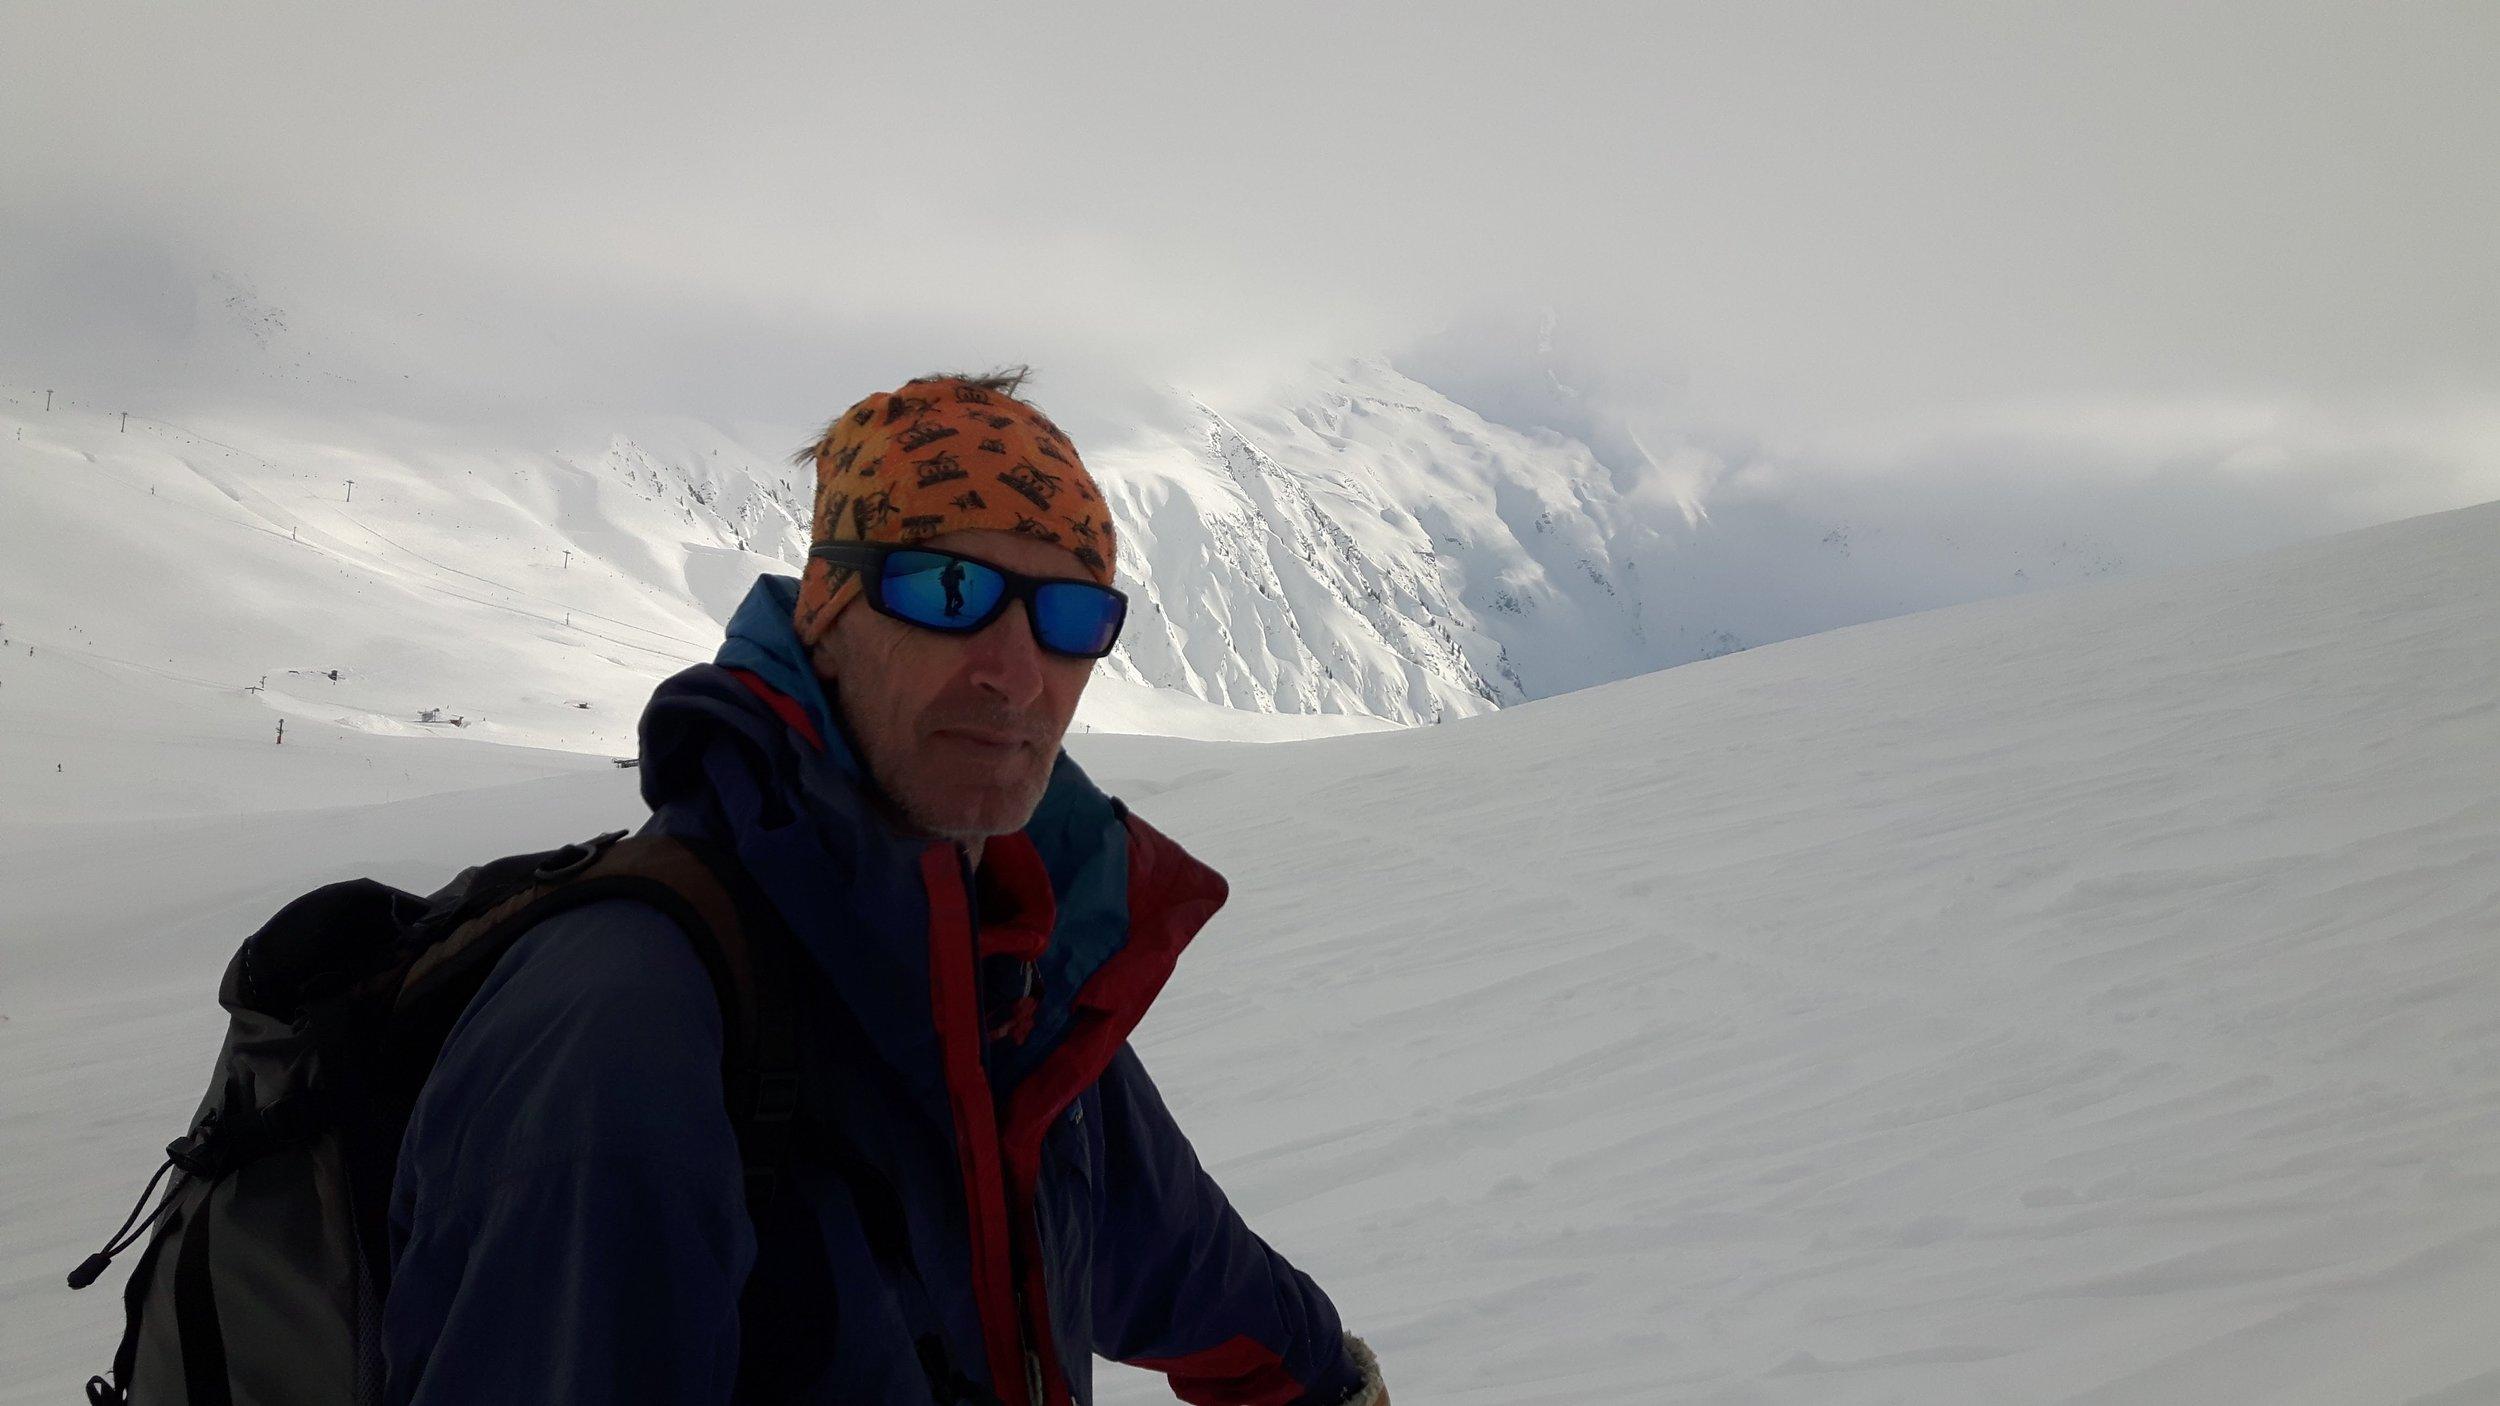 Pete with the Le Tour area and the Le Tour glacier behind